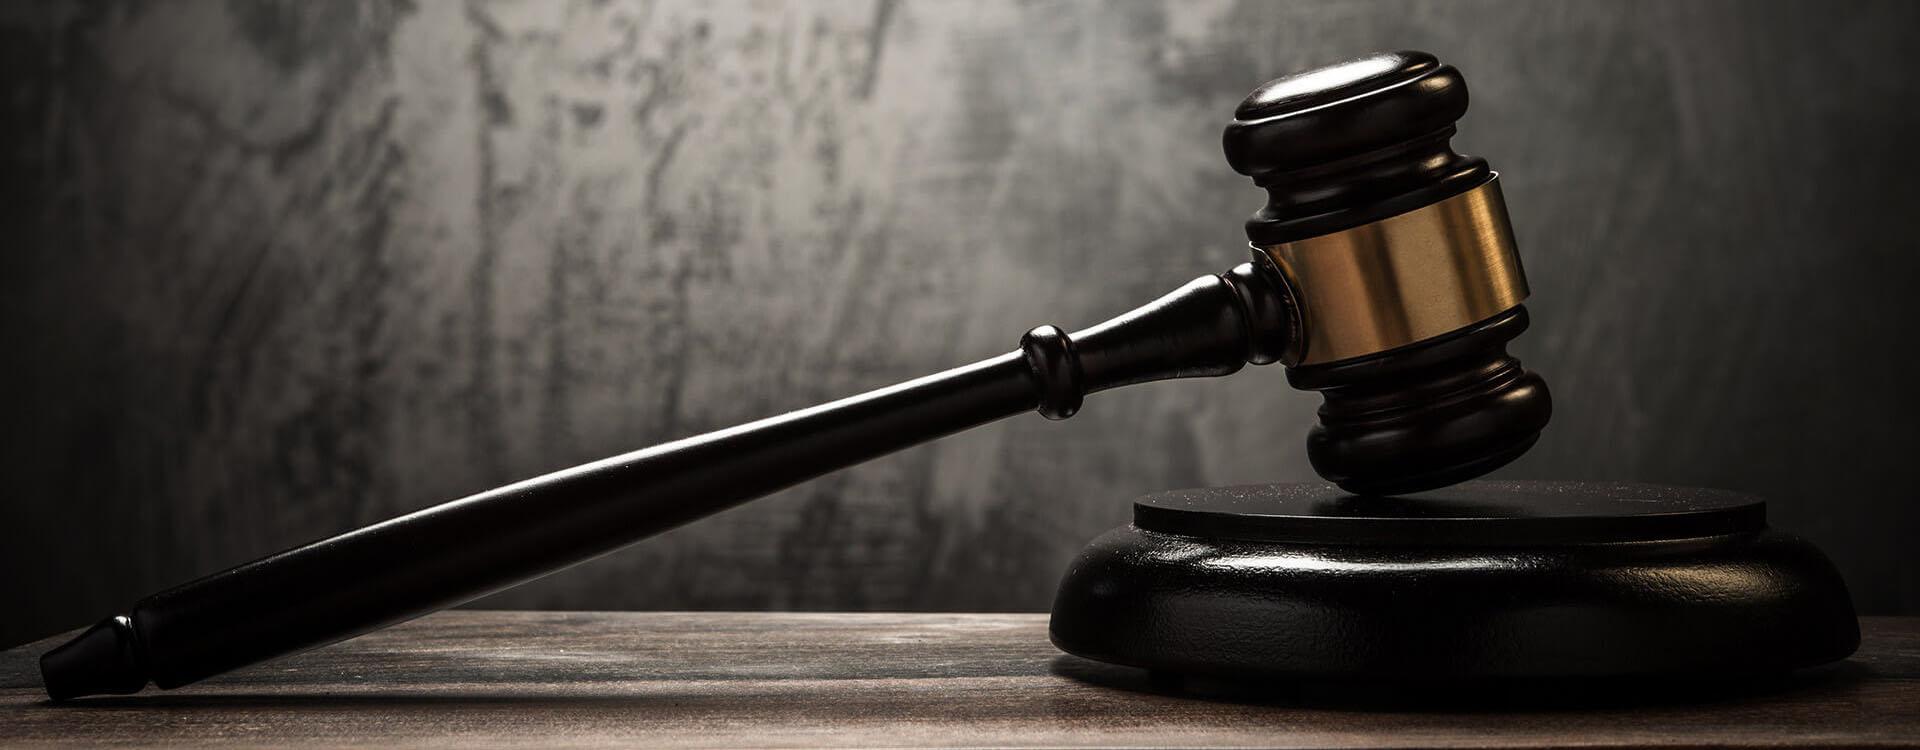 law-legal1-ss-1920